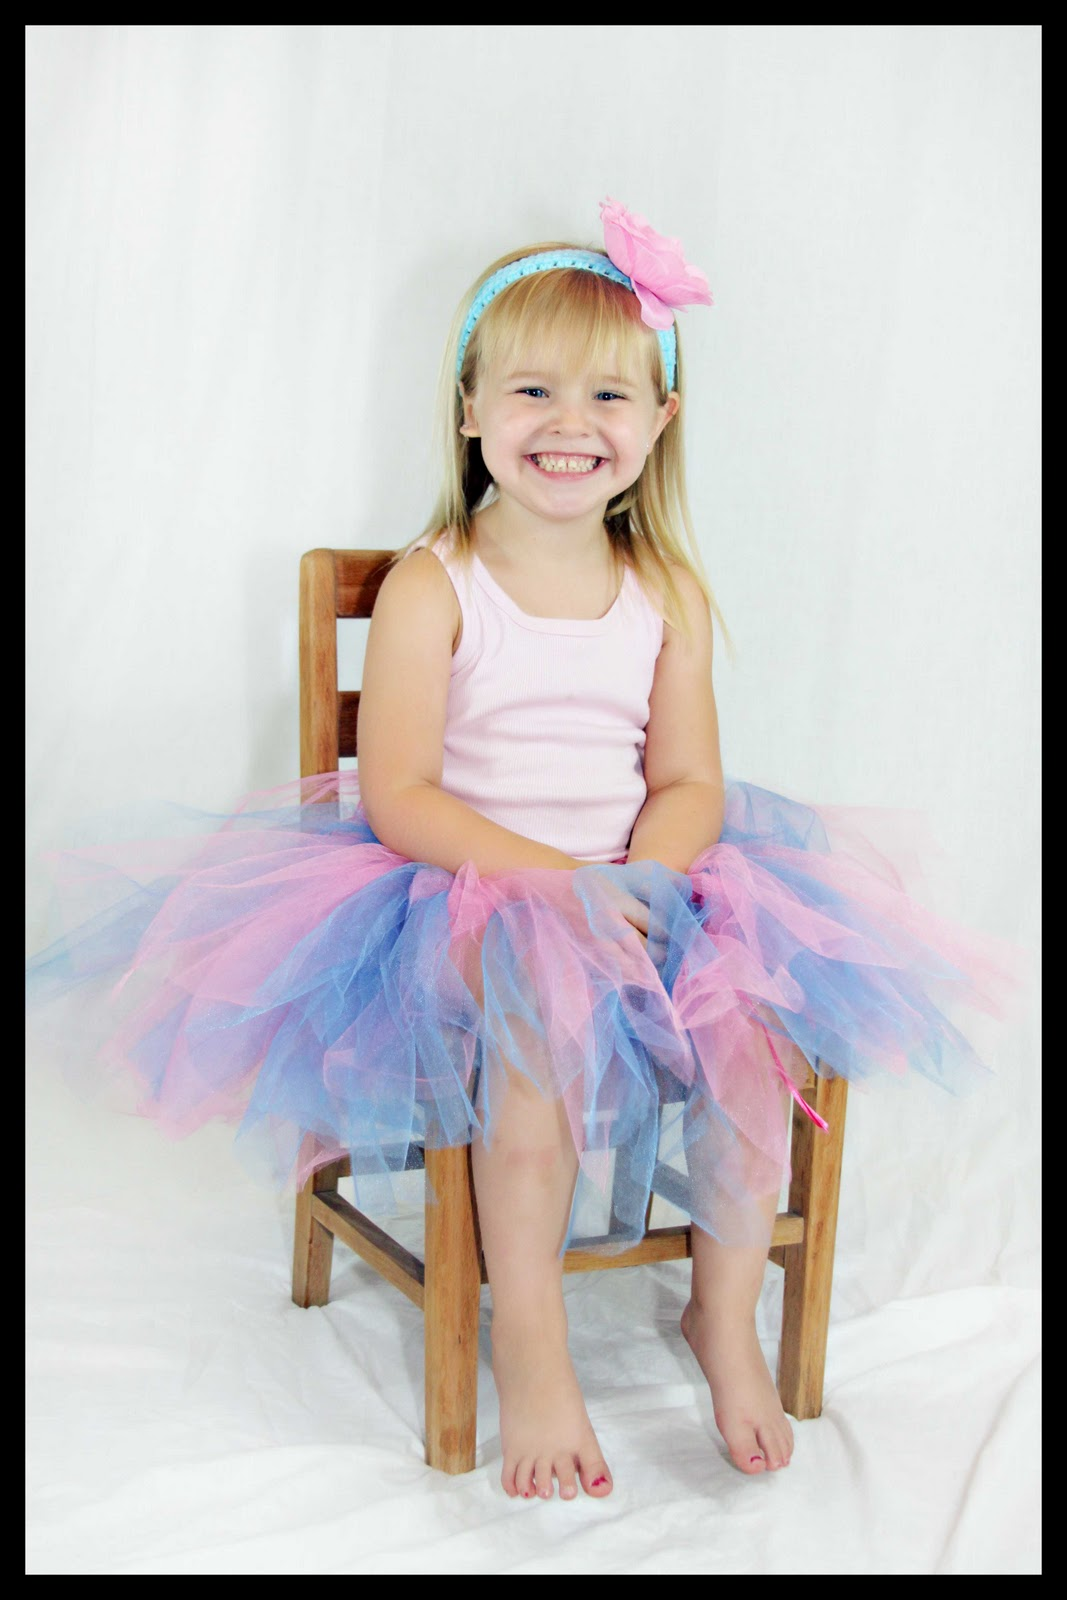 Http Captured Memories Photography Blogspot Com 2010 10 Adorable Girls Html